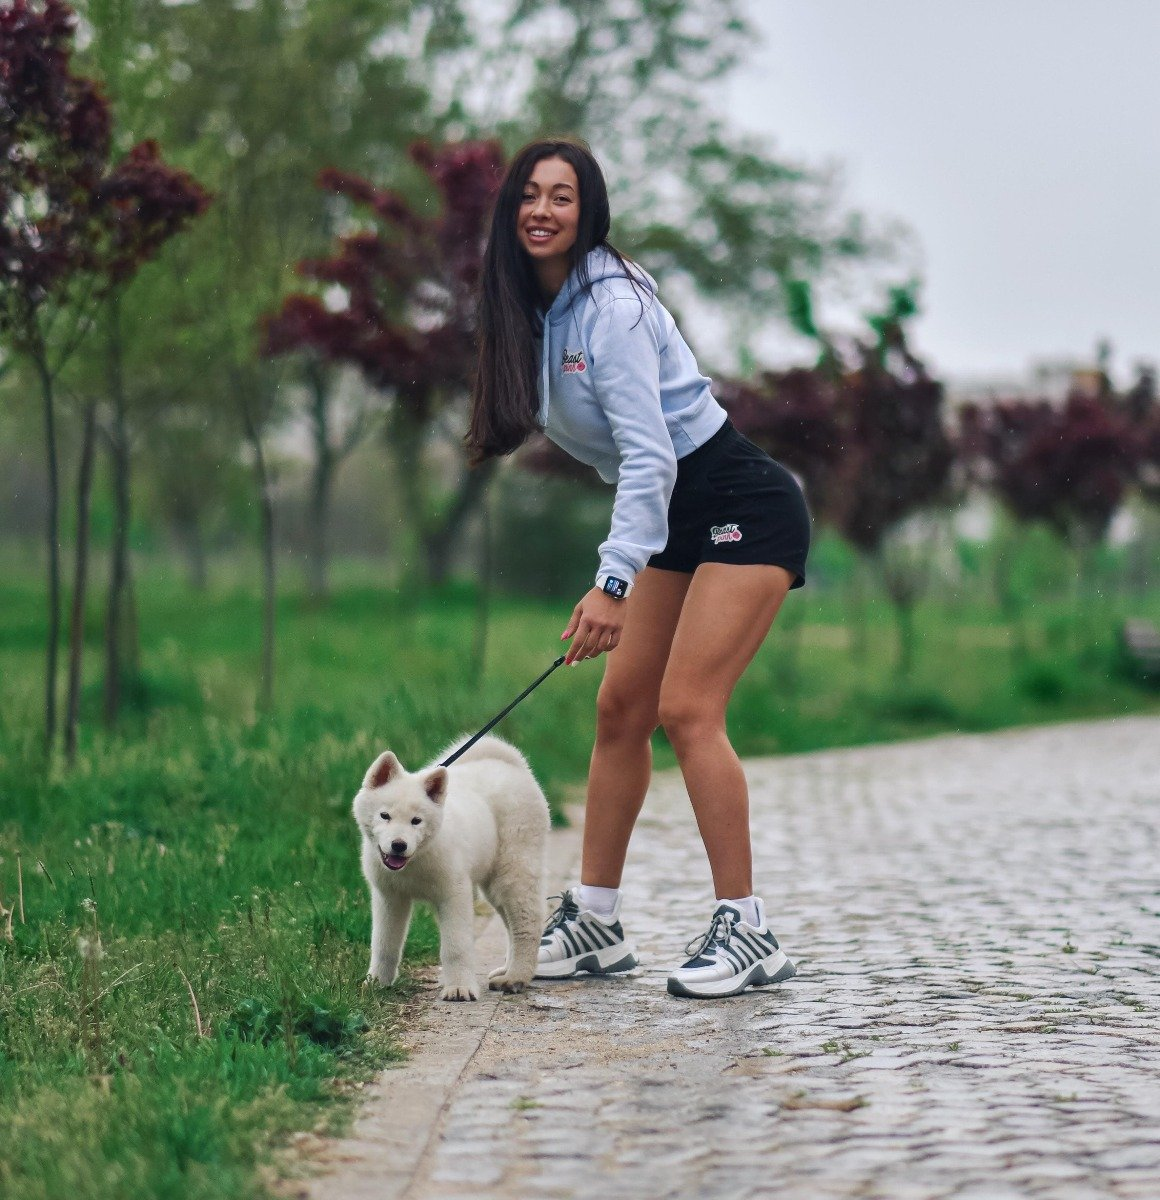 Non-exercise activity thermogenesis